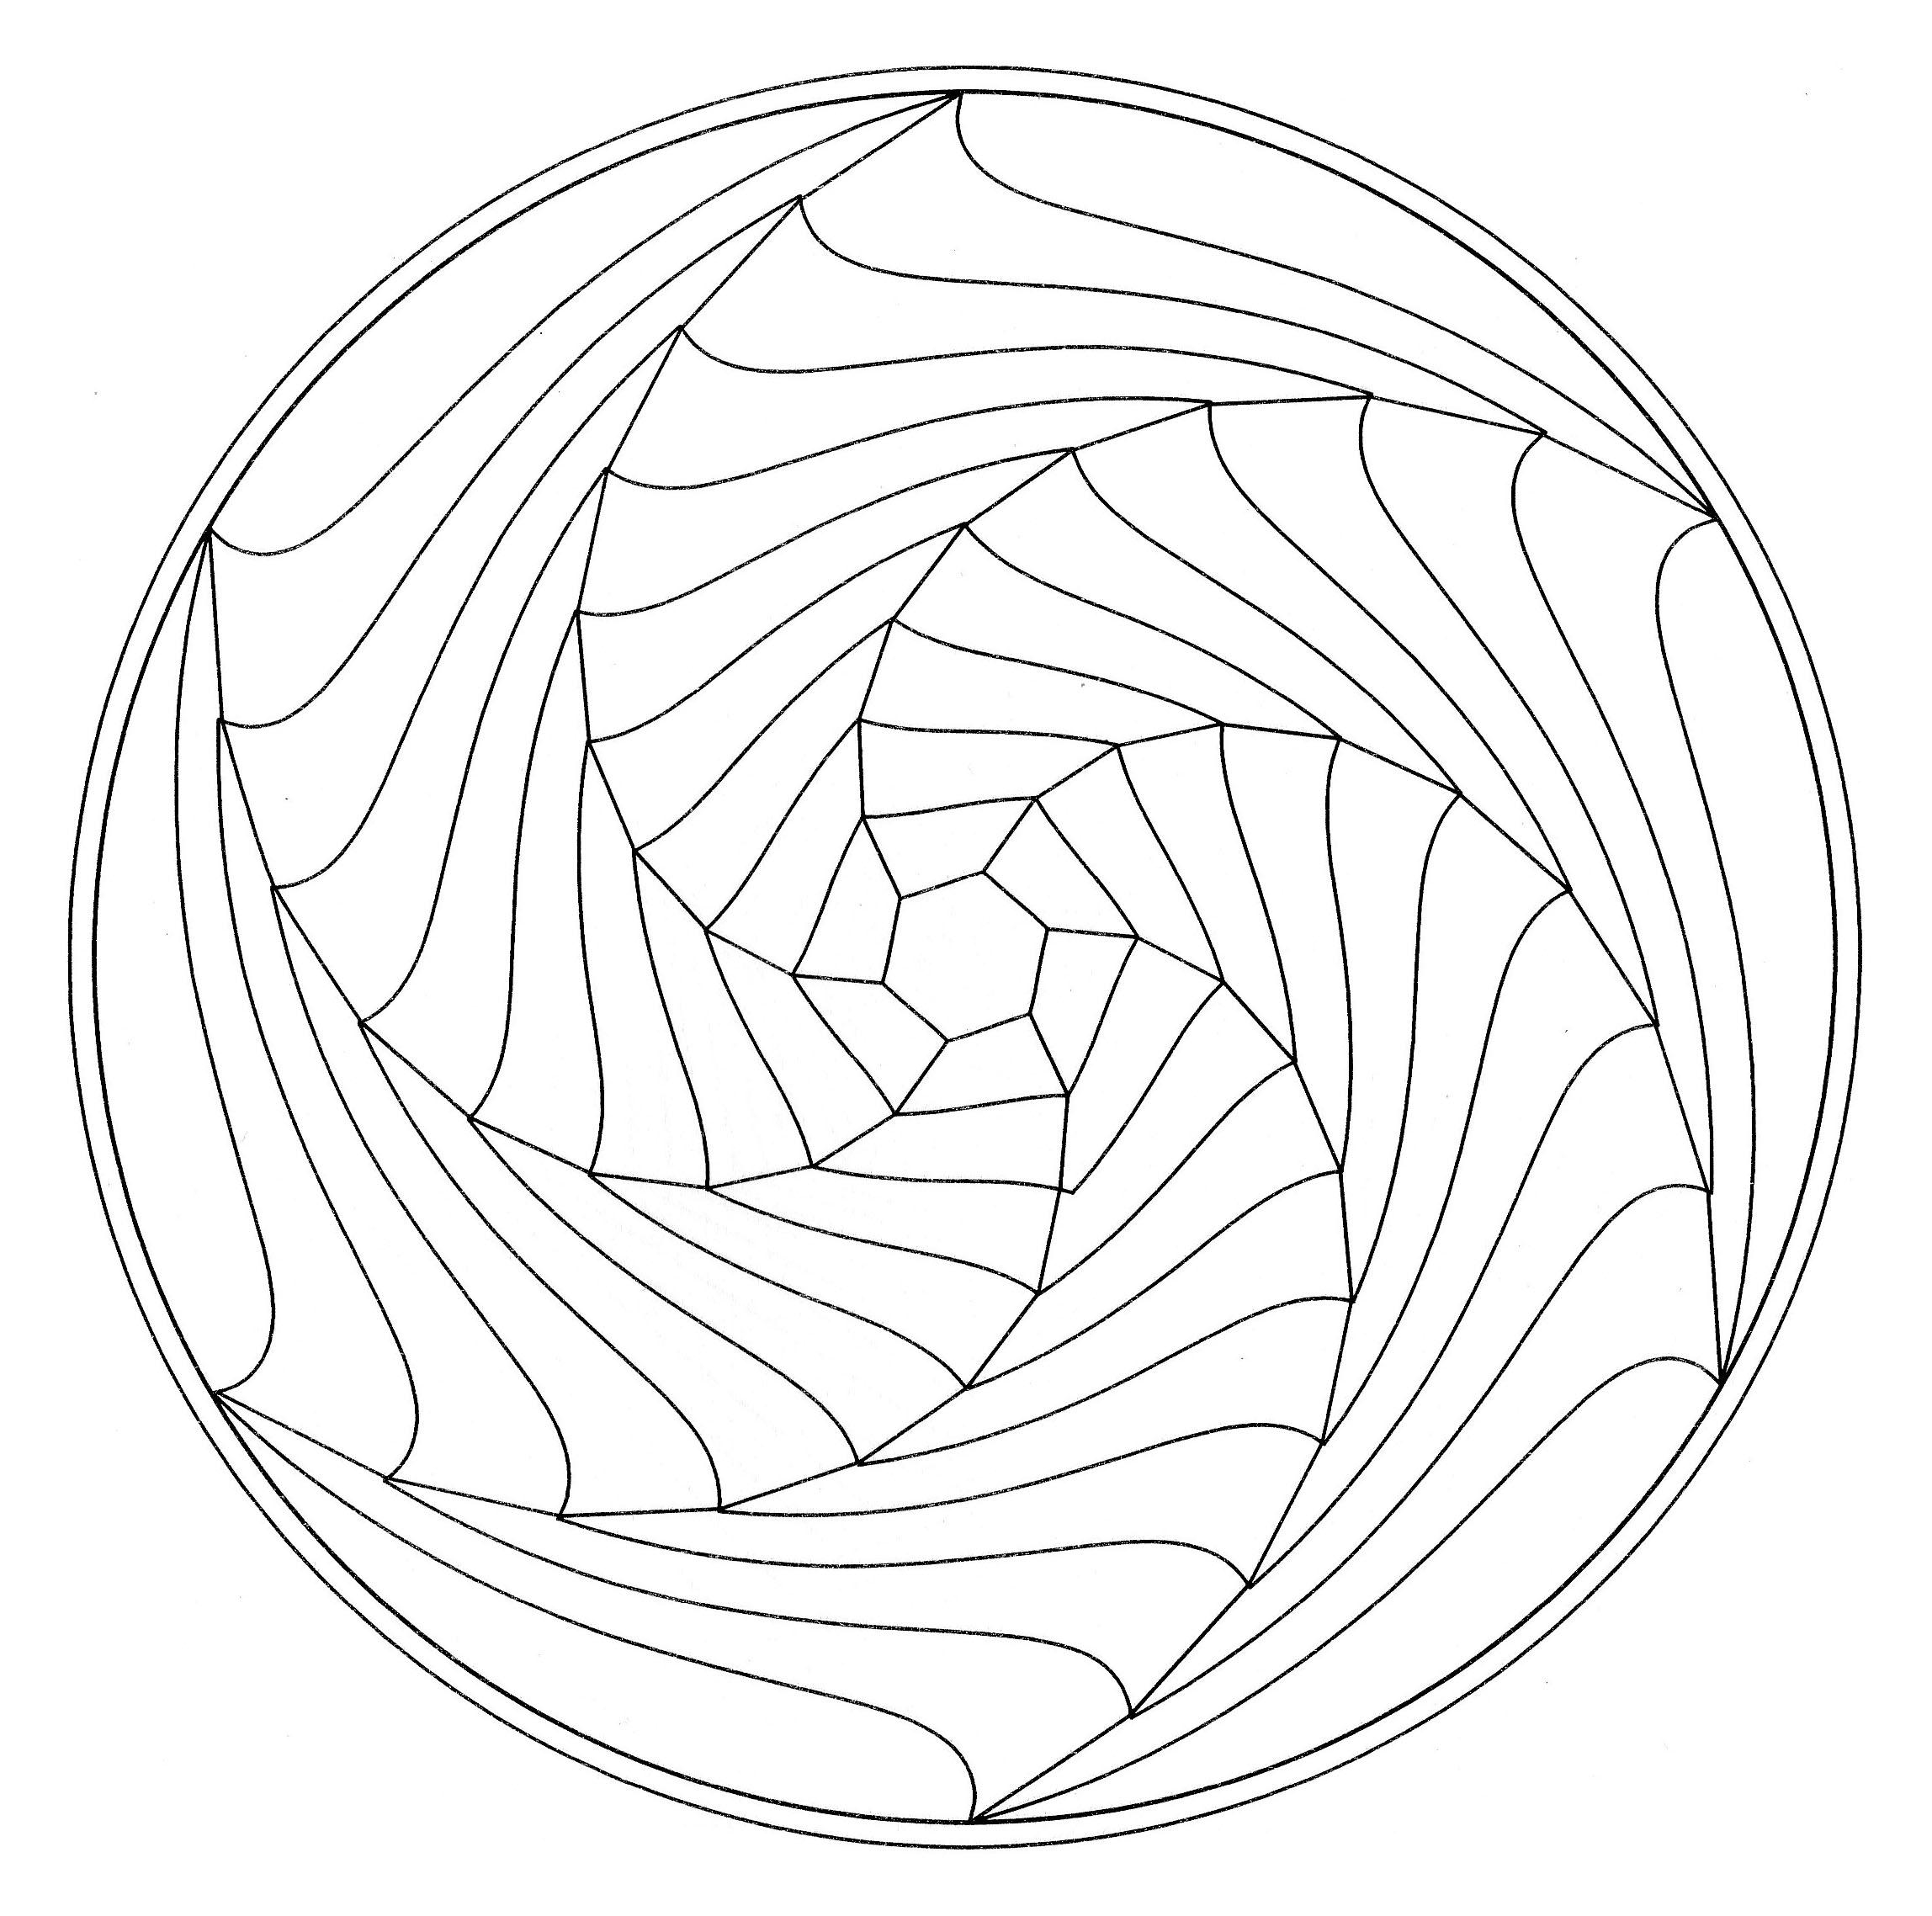 Mandala illusion optique mandalas coloriages - Image mandala a imprimer ...